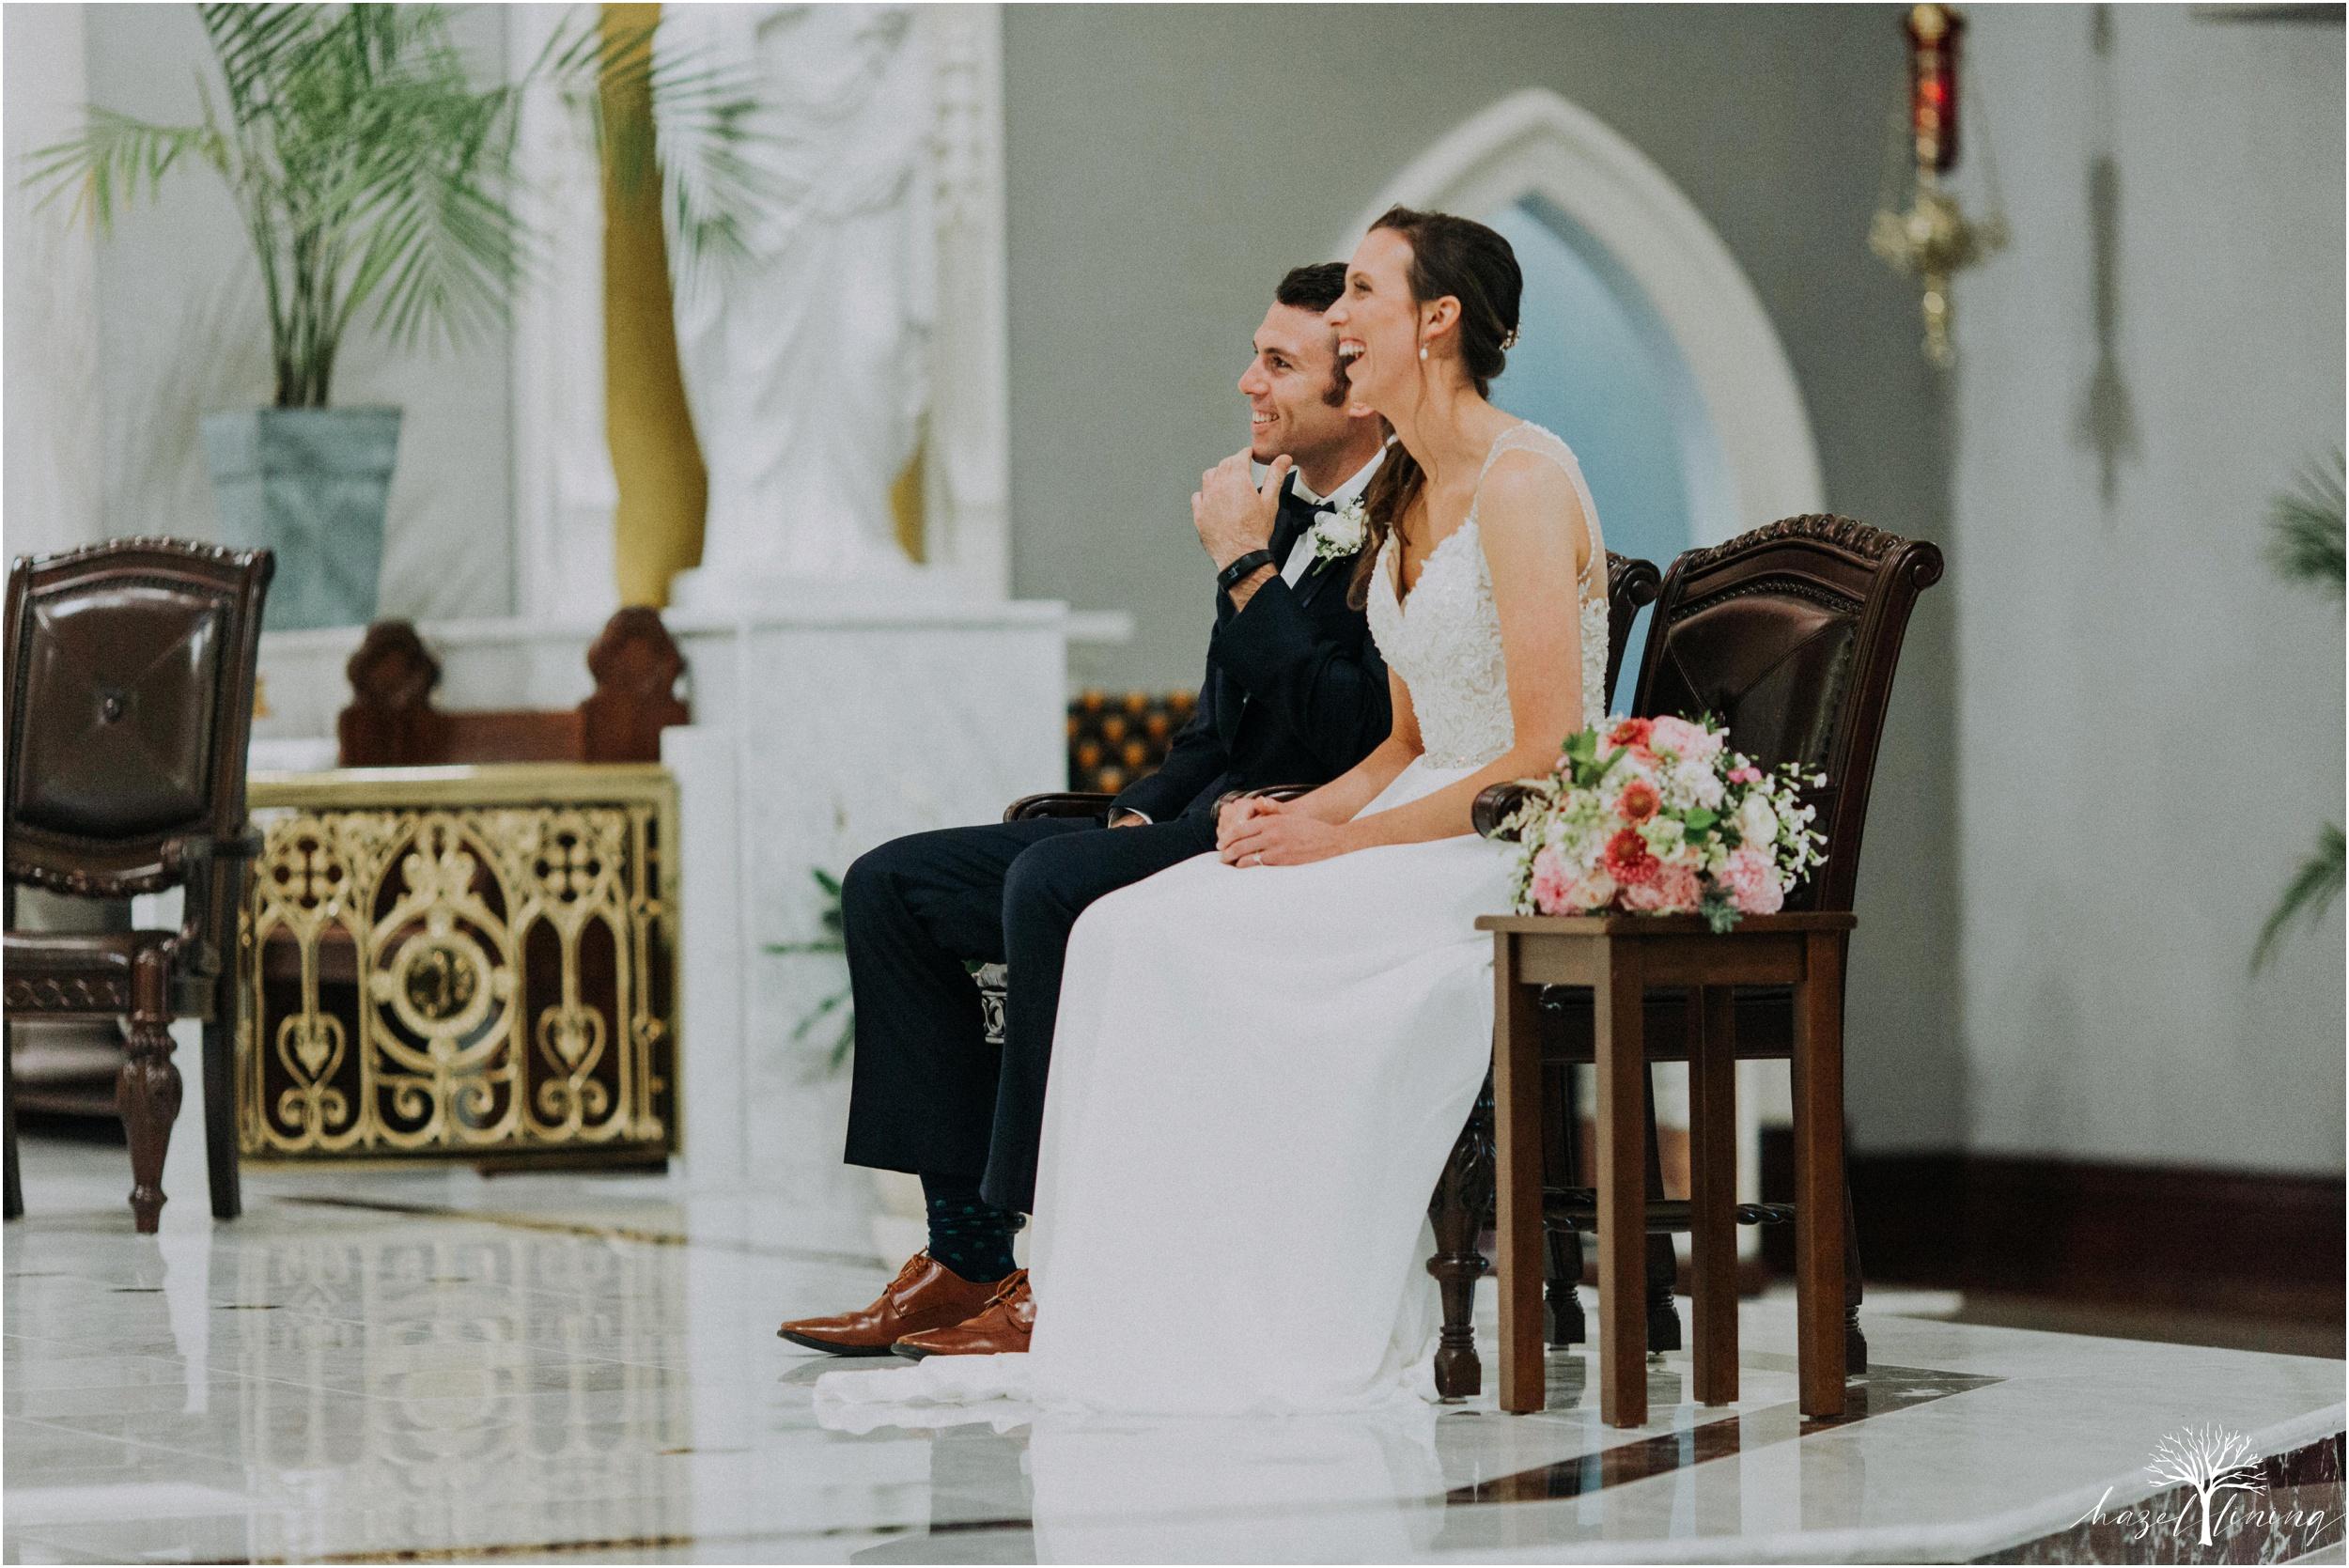 hazel-lining-travel-wedding-elopement-photography_0056.jpg